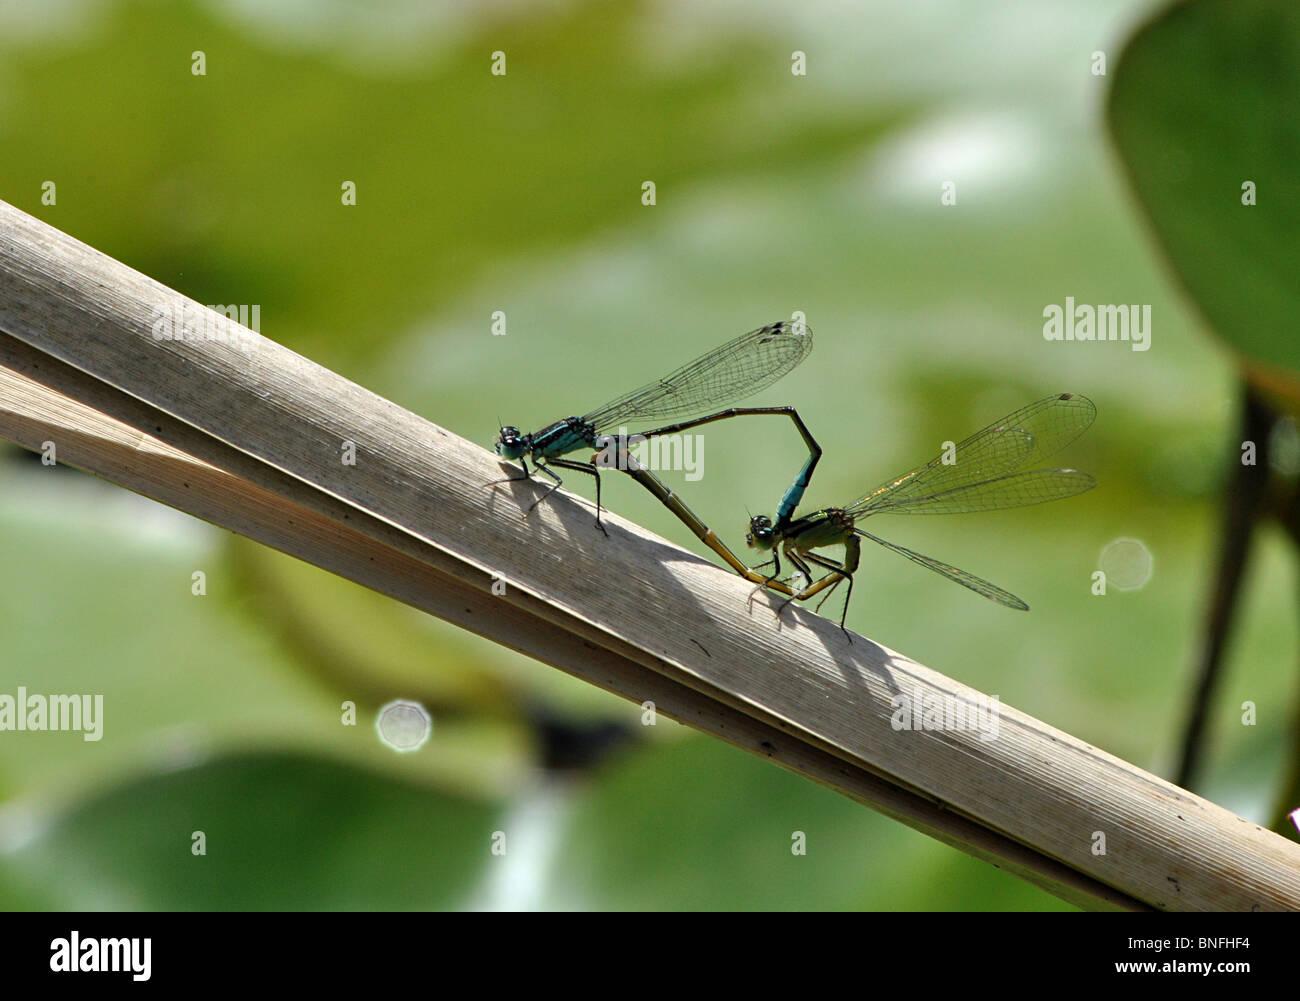 Mating dragonflies, England - Stock Image